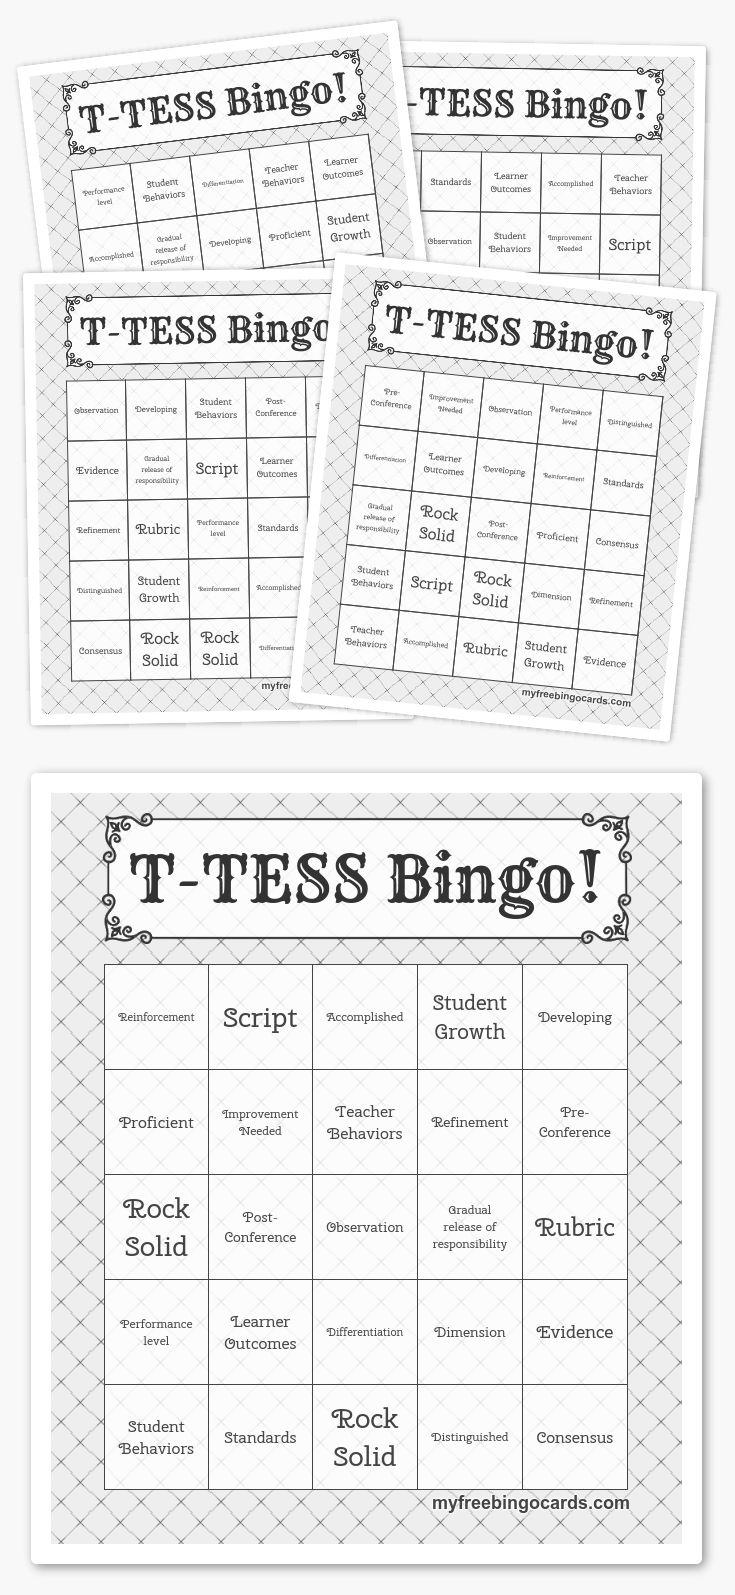 T-TESS Bingo!